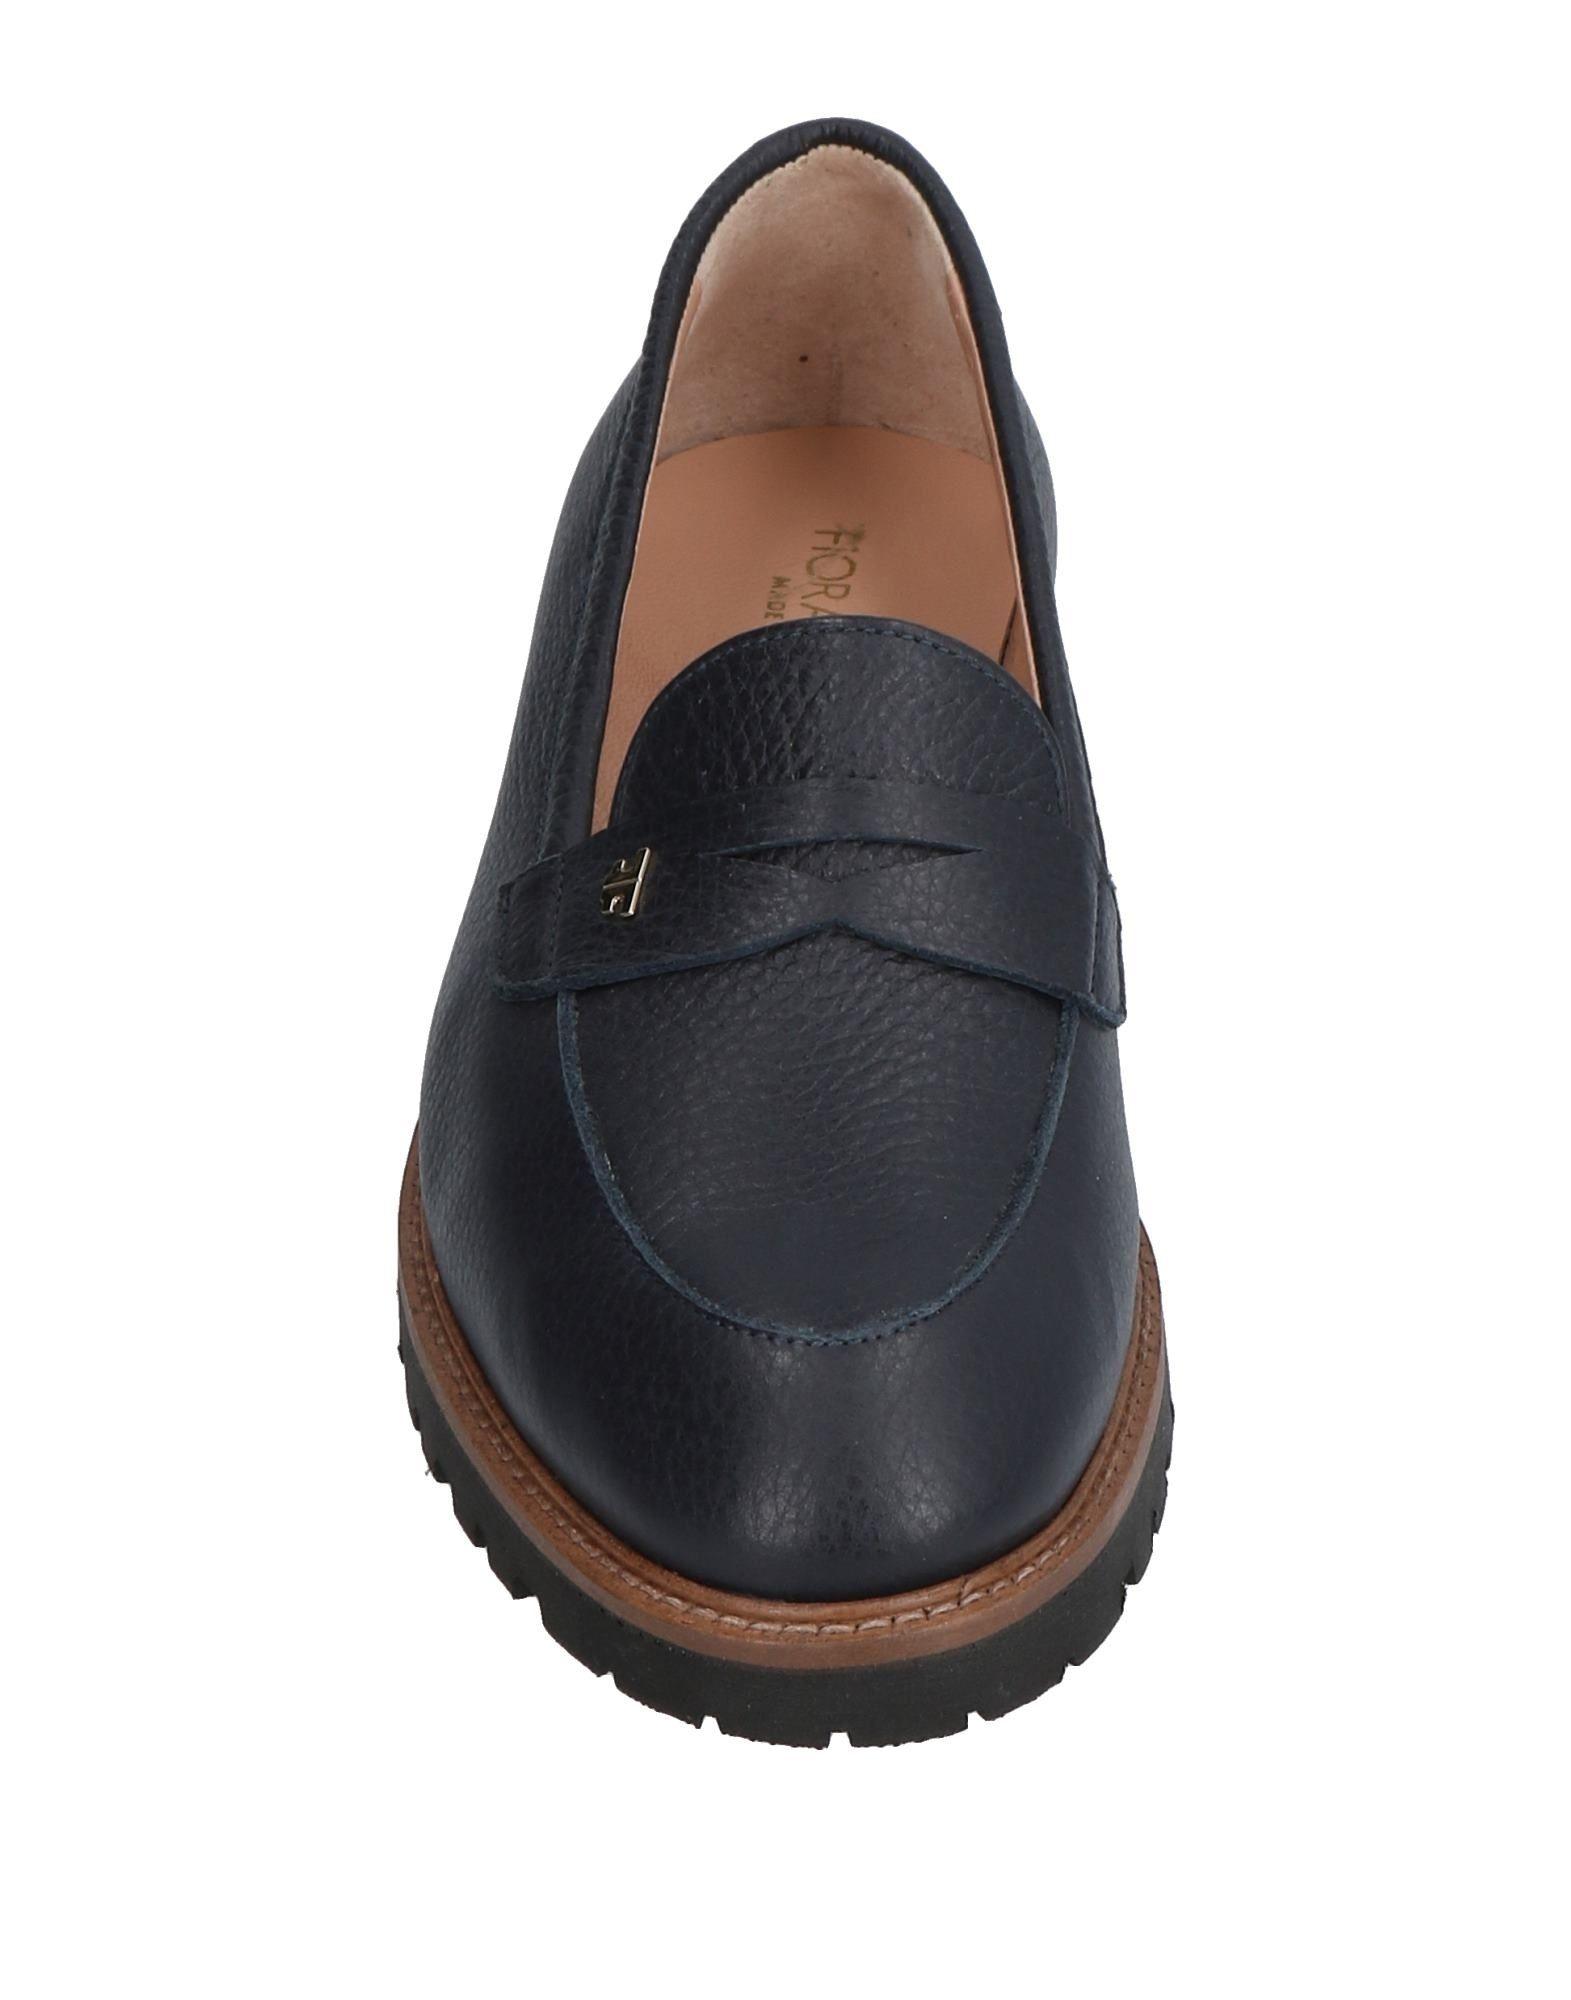 Fiorangelo Loafers - Women Fiorangelo Loafers online - on  United Kingdom - online 11448214AG 154b0e